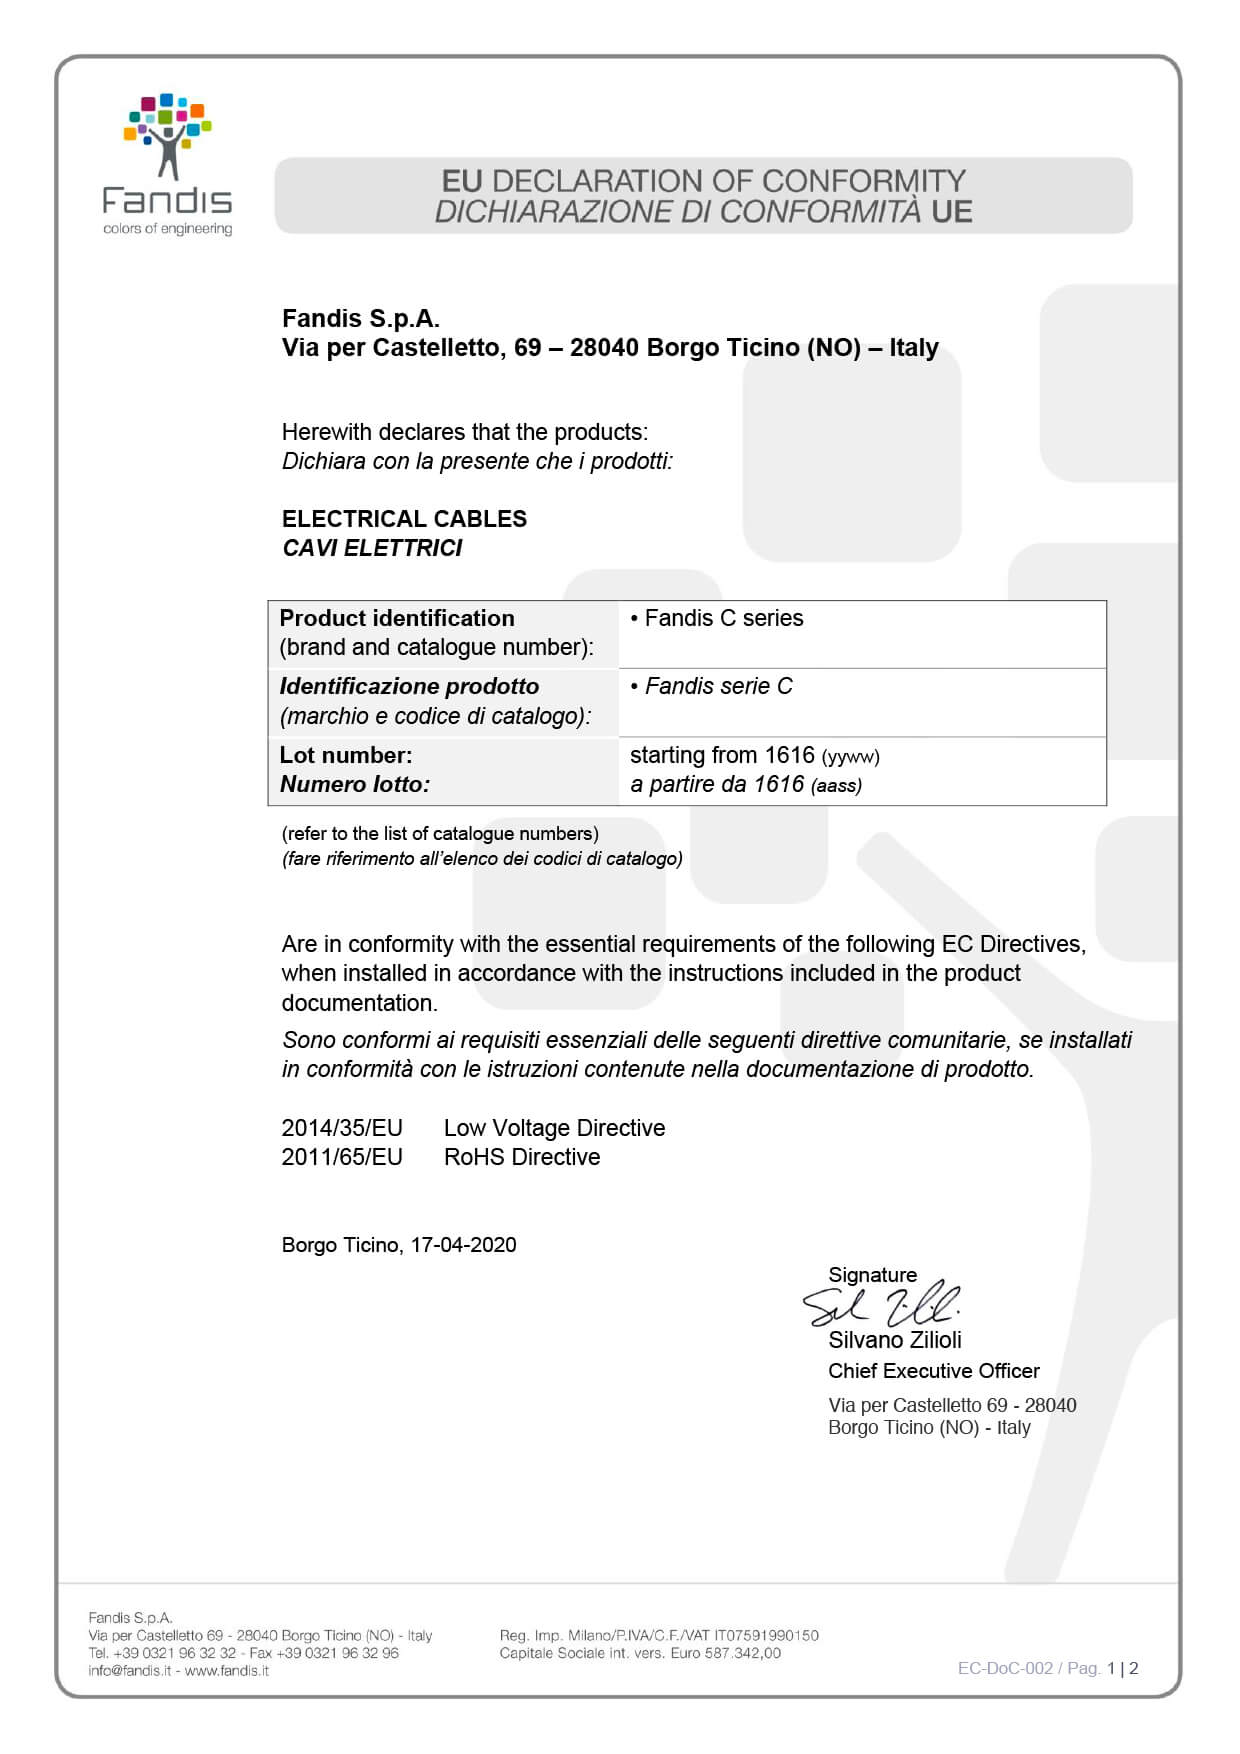 EC DoC 002 cavi elettrici